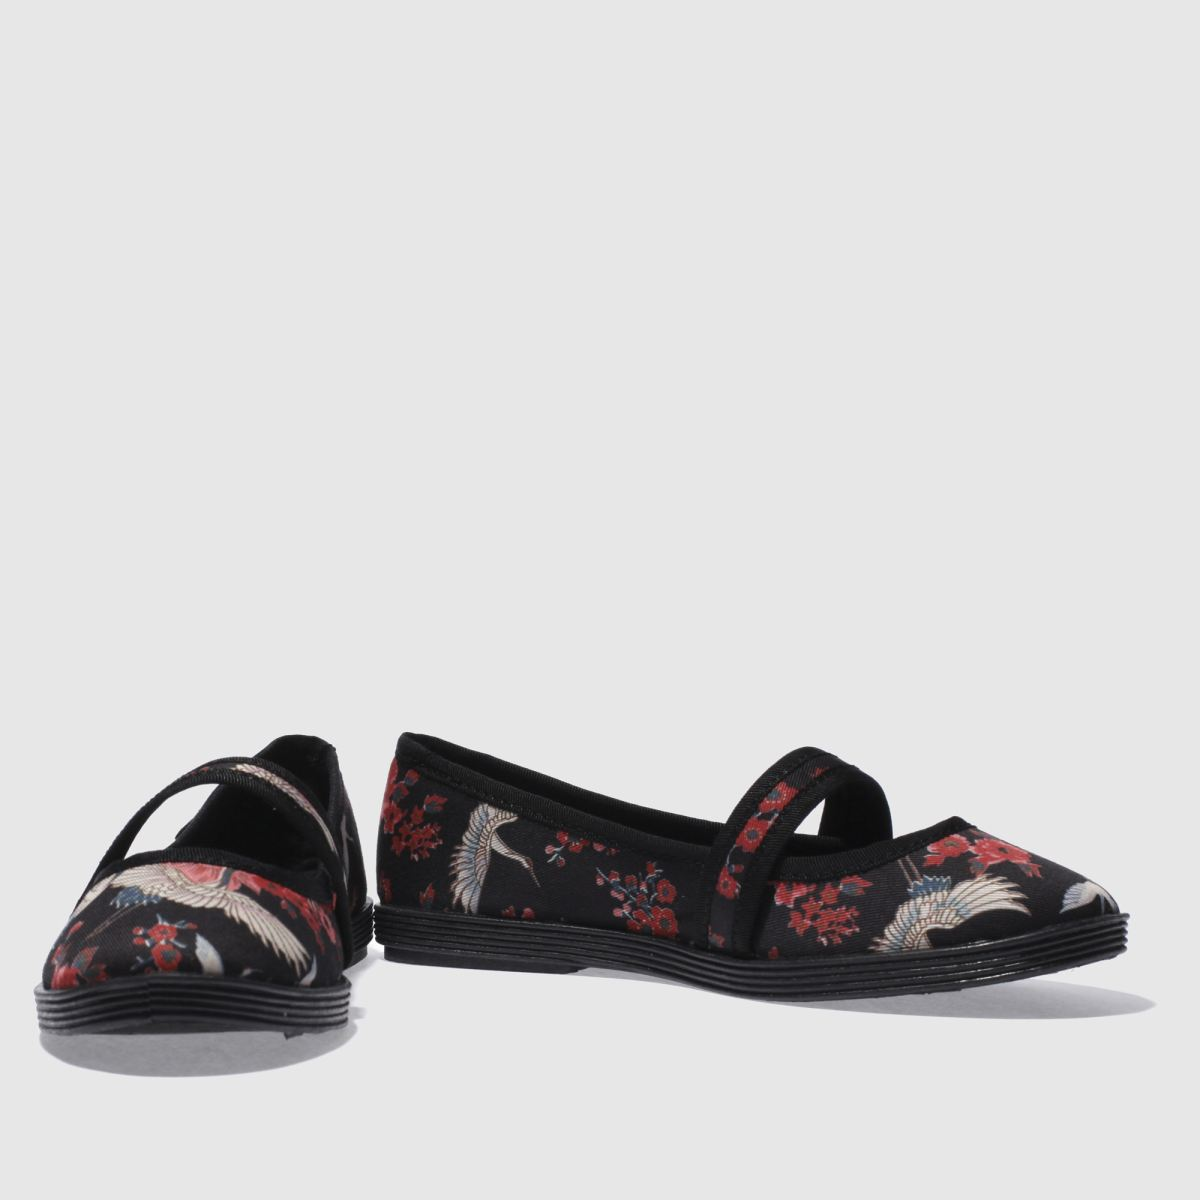 Damen Schwarz-rot blowfish Goji Gute Haiku Flats | schuh Gute Goji Qualität beliebte Schuhe cceea2